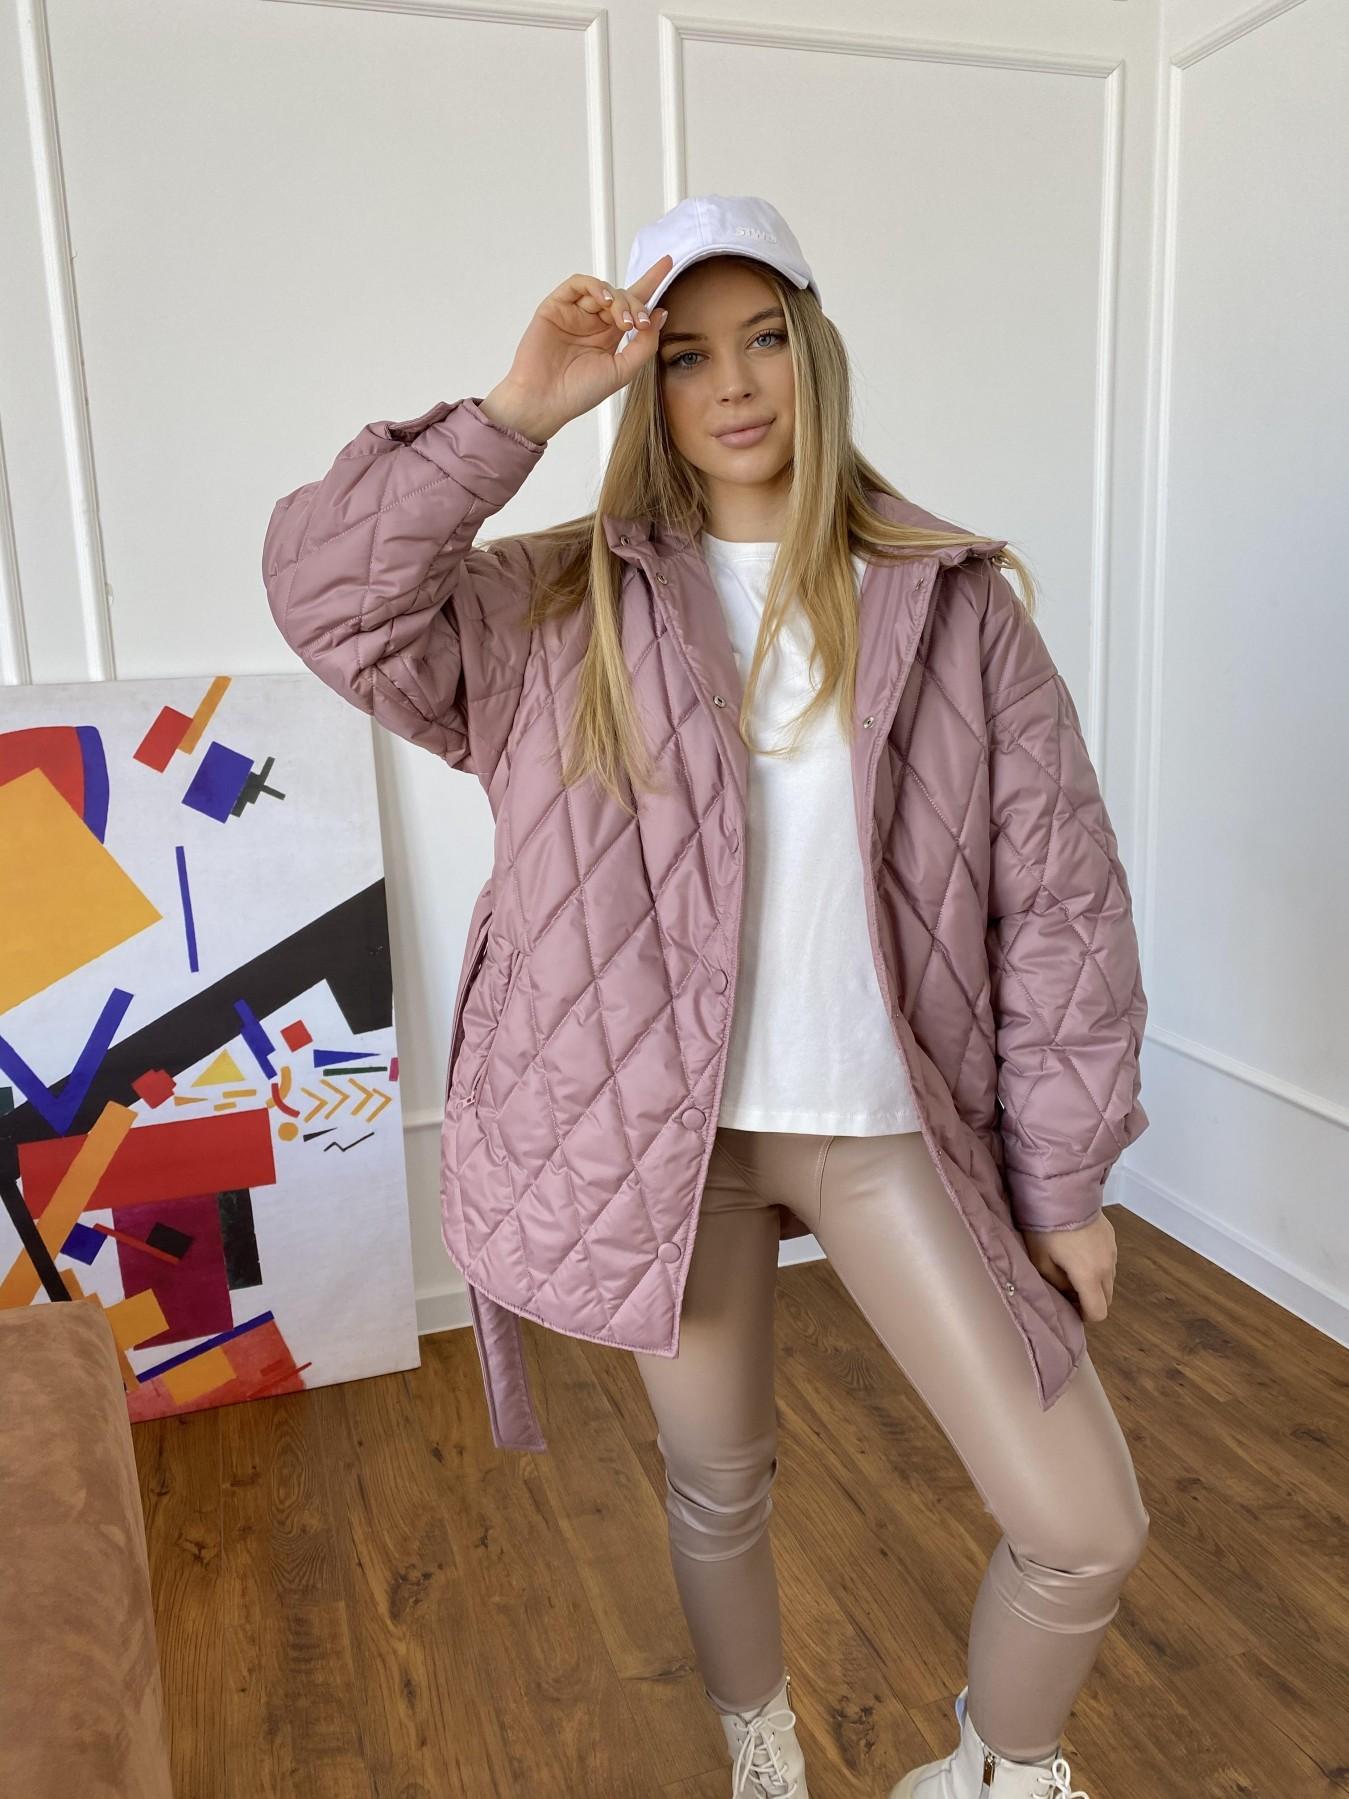 Пазл стеганая куртка из плащевки 10890 АРТ. 47400 Цвет: Пудра - фото 5, интернет магазин tm-modus.ru